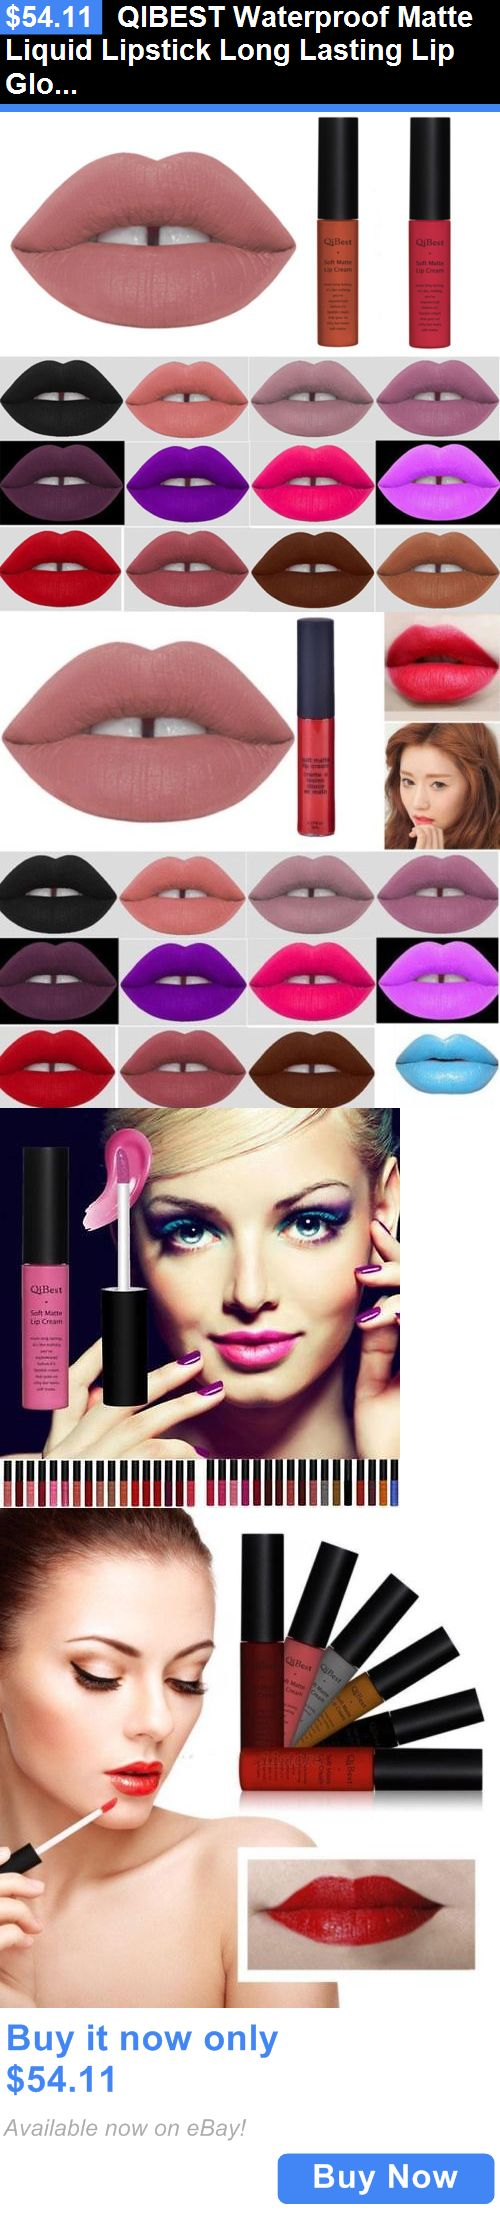 Beauty Makeup: Qibest Waterproof Matte Liquid Lipstick Long Lasting Lip Gloss Lipstick Beauty BUY IT NOW ONLY: $54.11